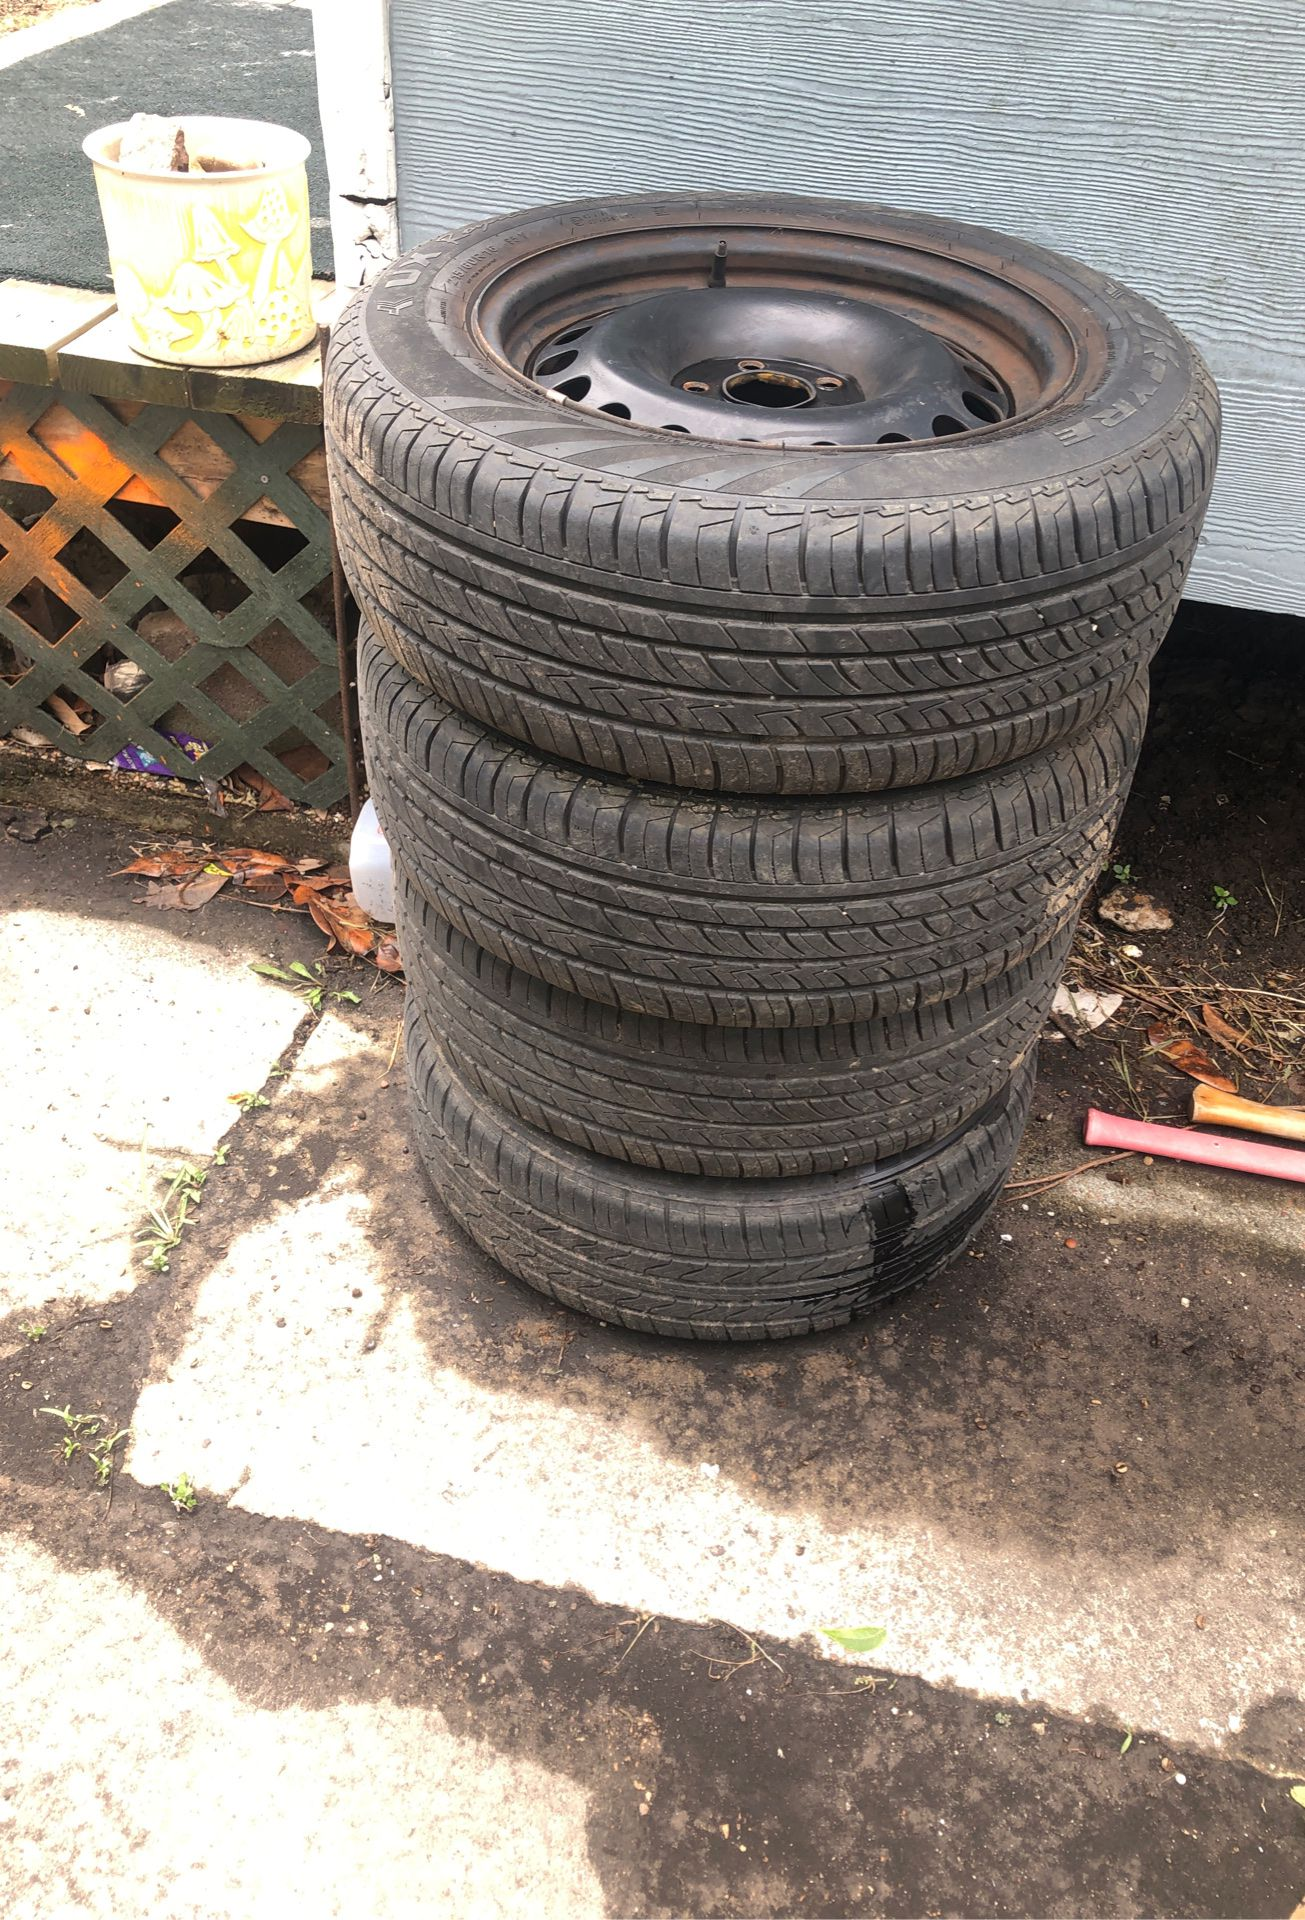 215/60R16 tires